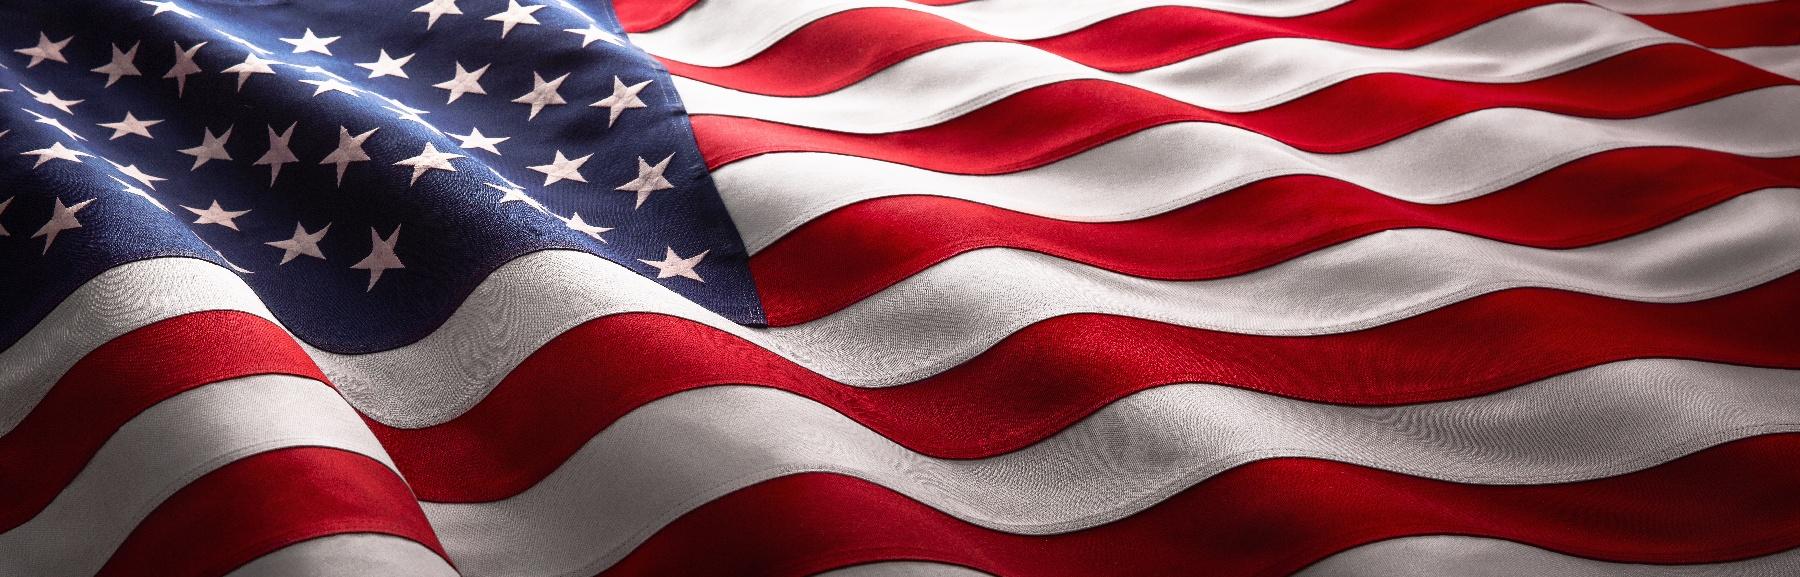 american flag-1